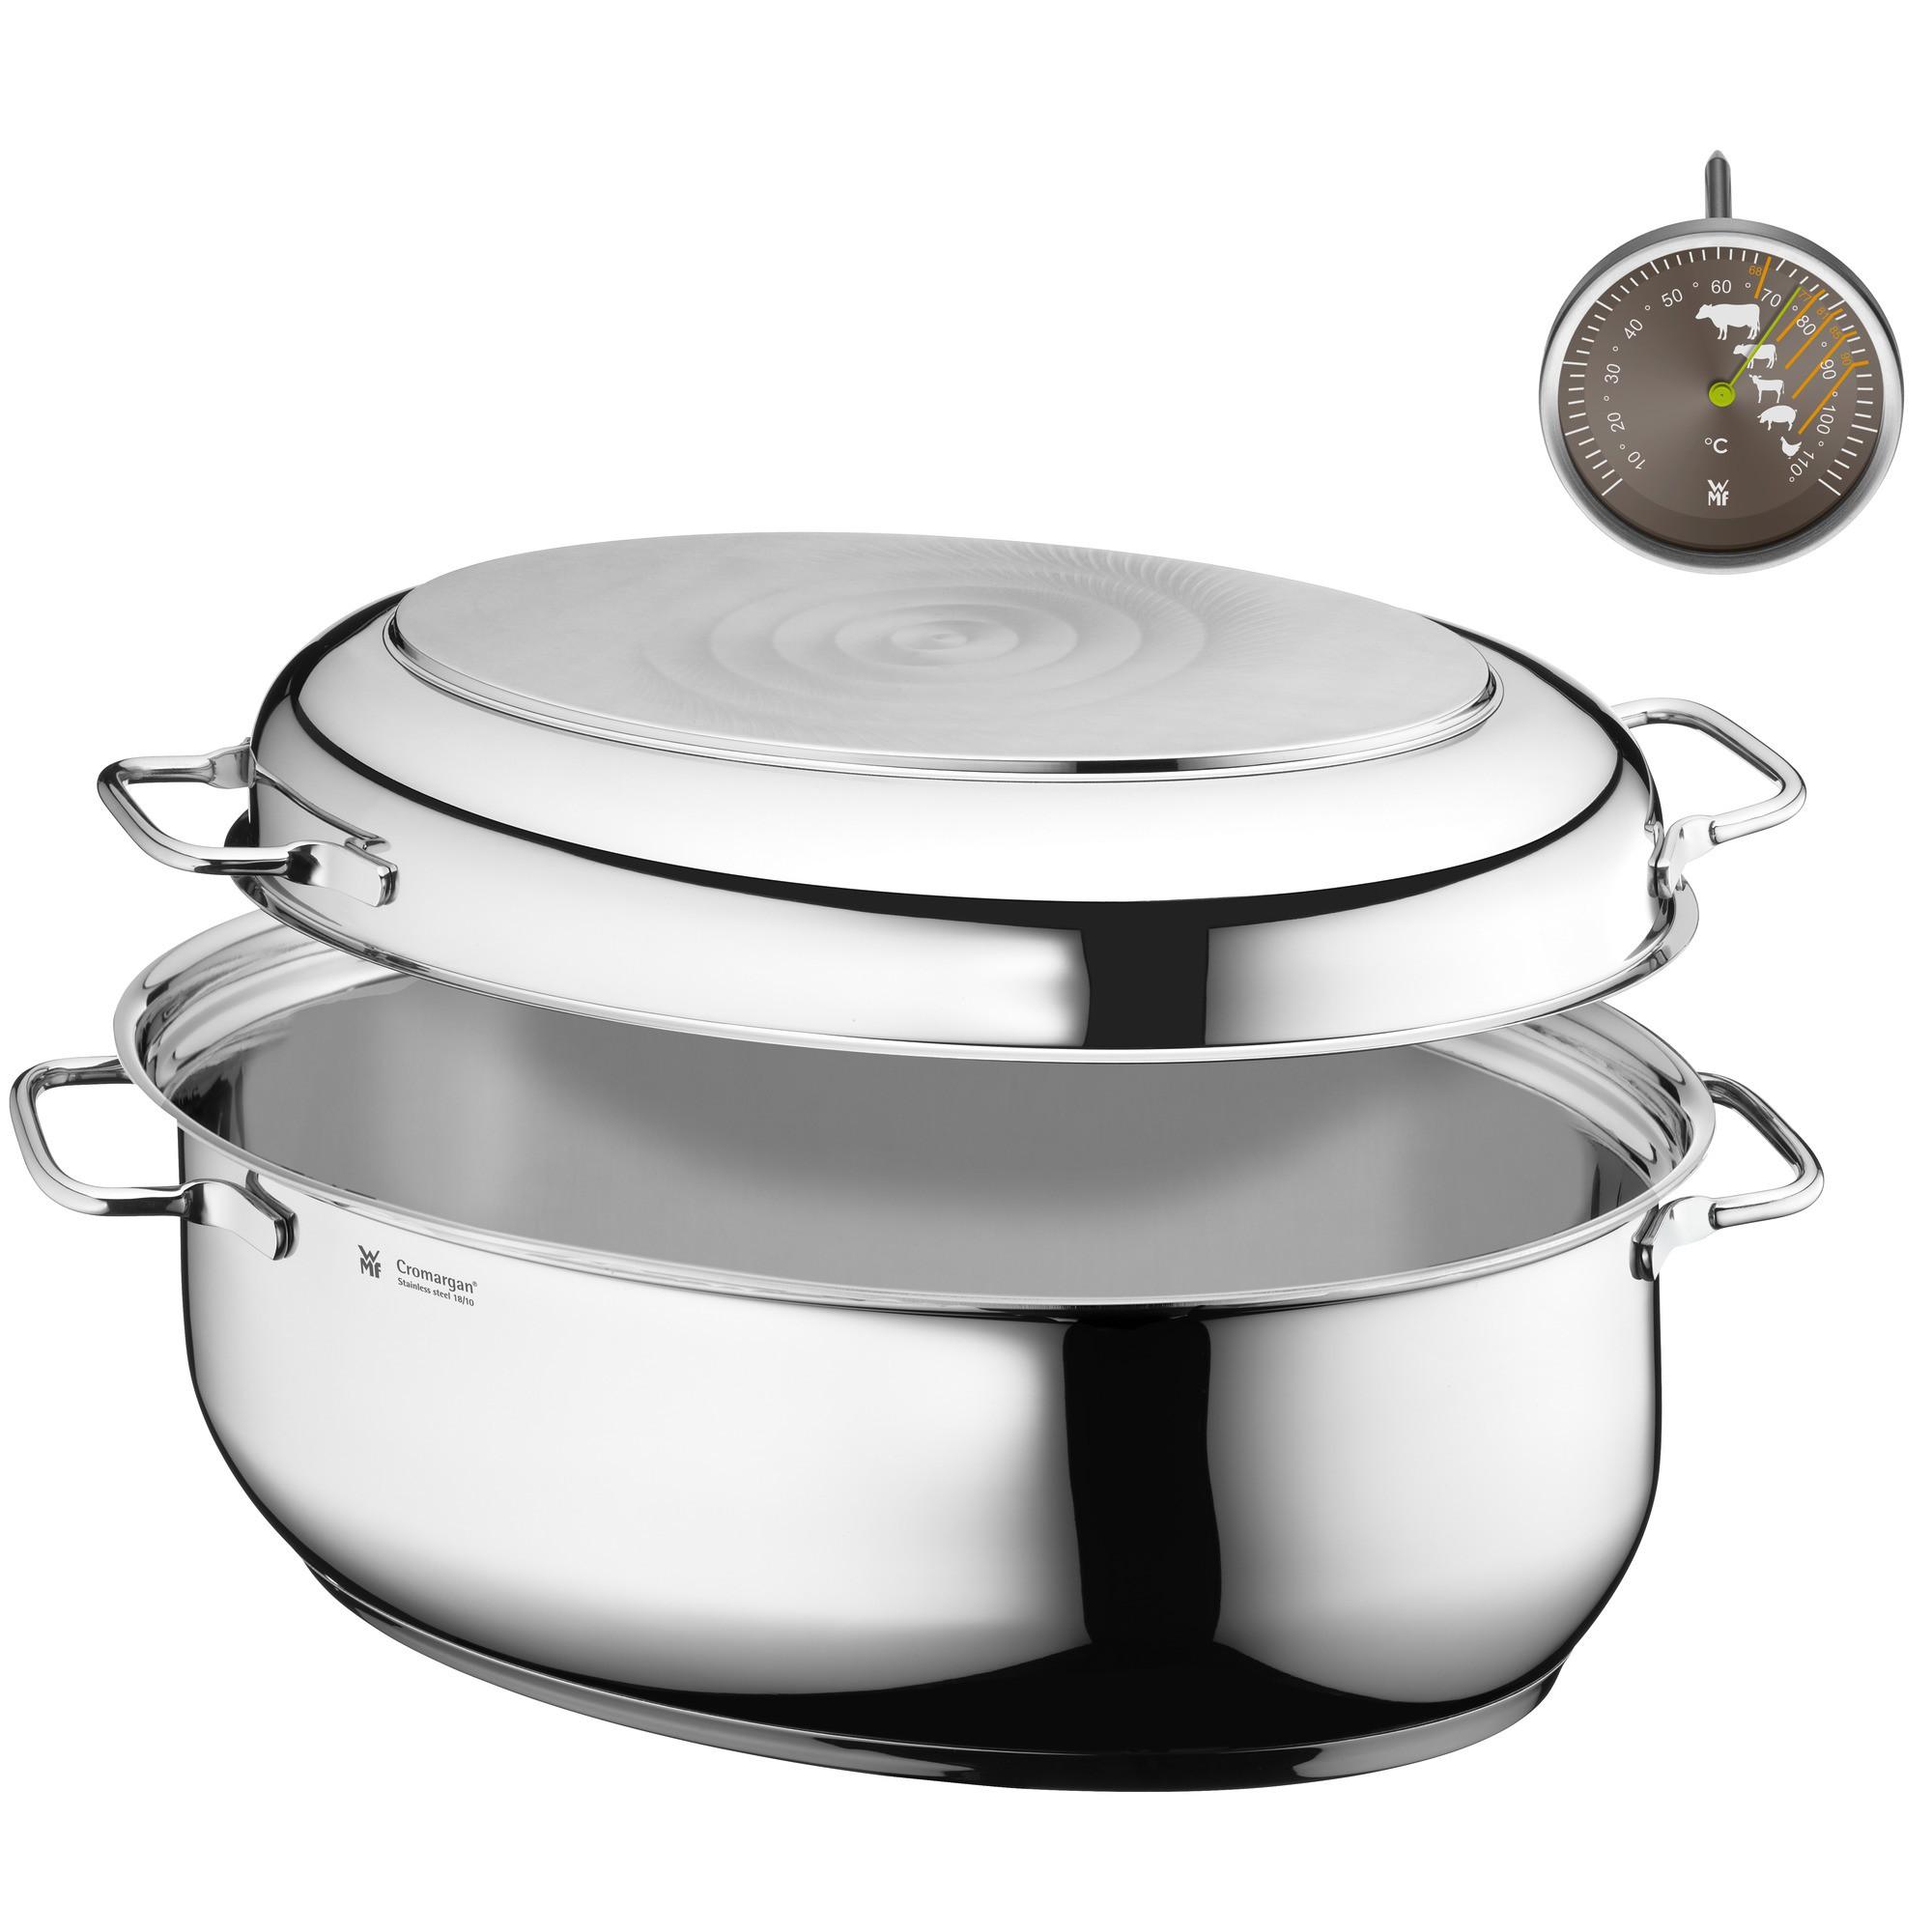 Pekáč s pokrievkou/panvicou oválny WMF 8,5 l  + kuchynský teplomer